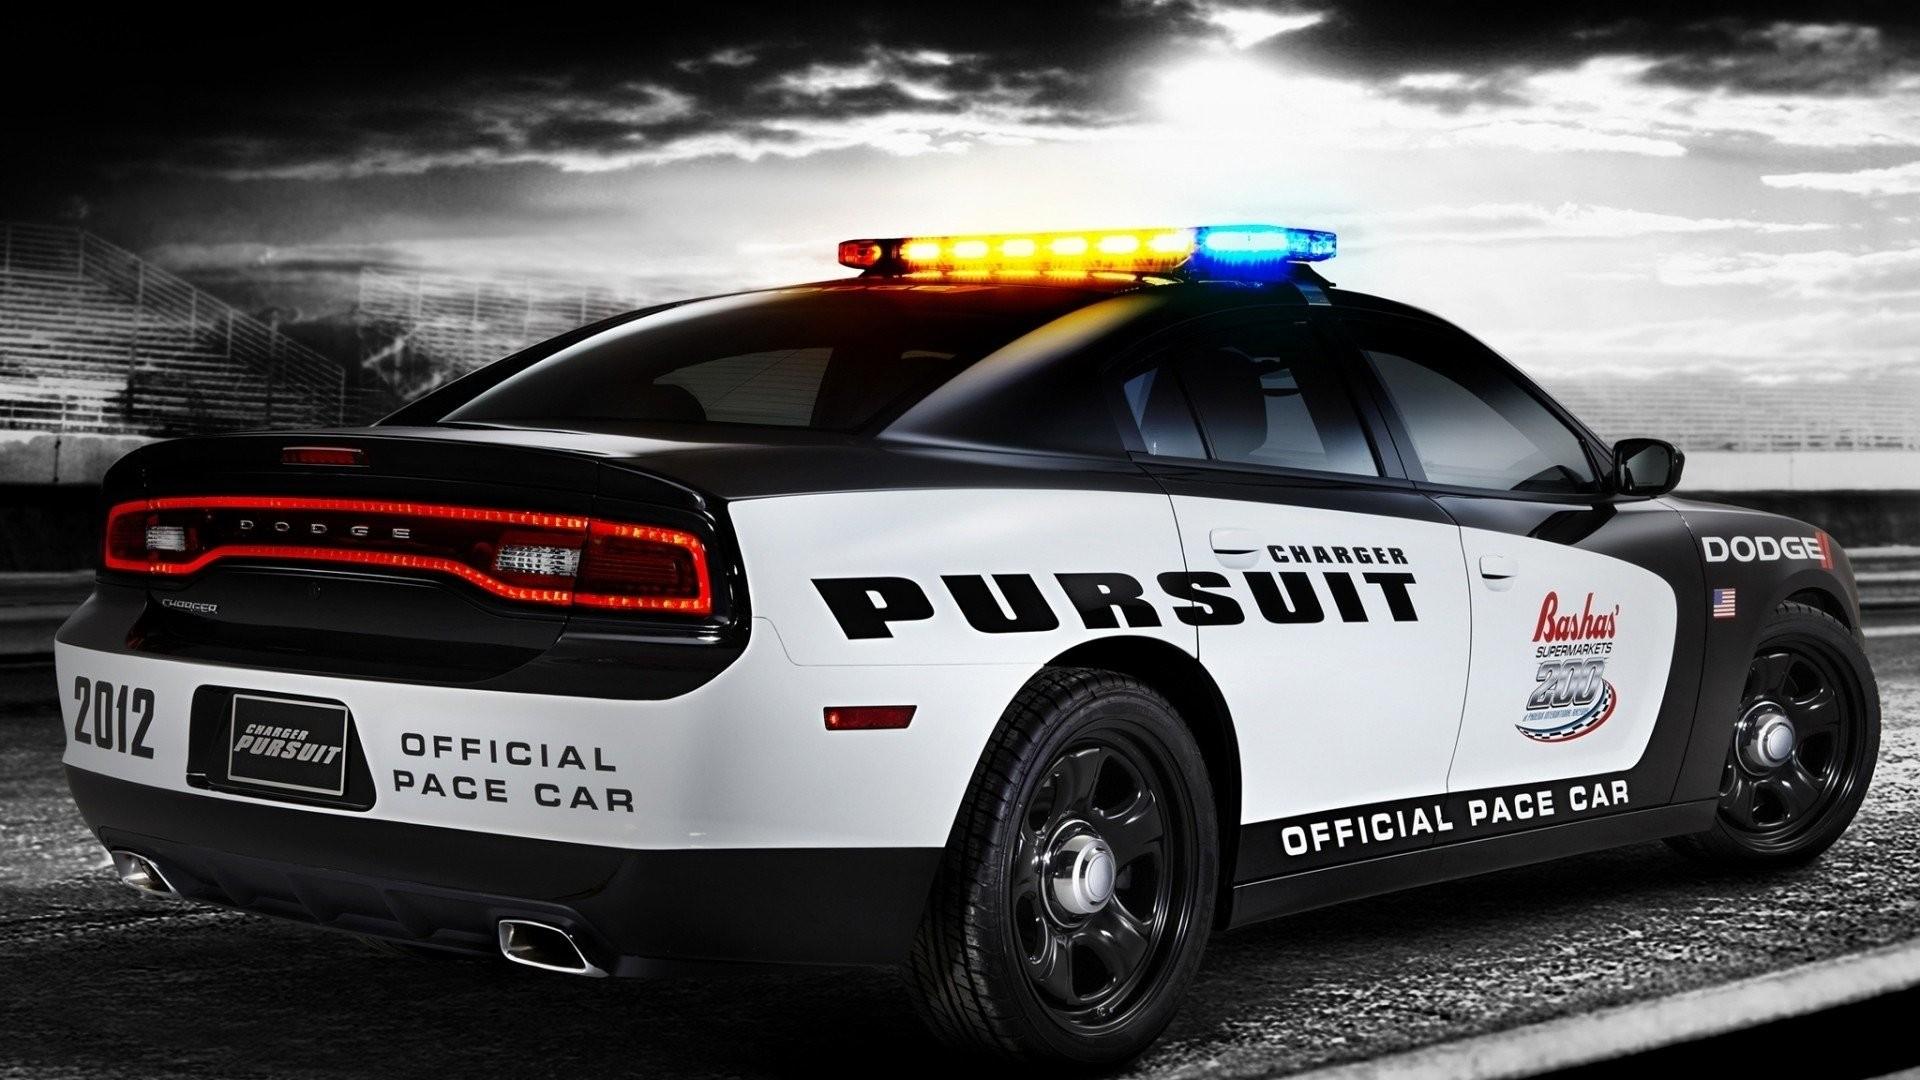 Res: 1920x1080, police car 833589